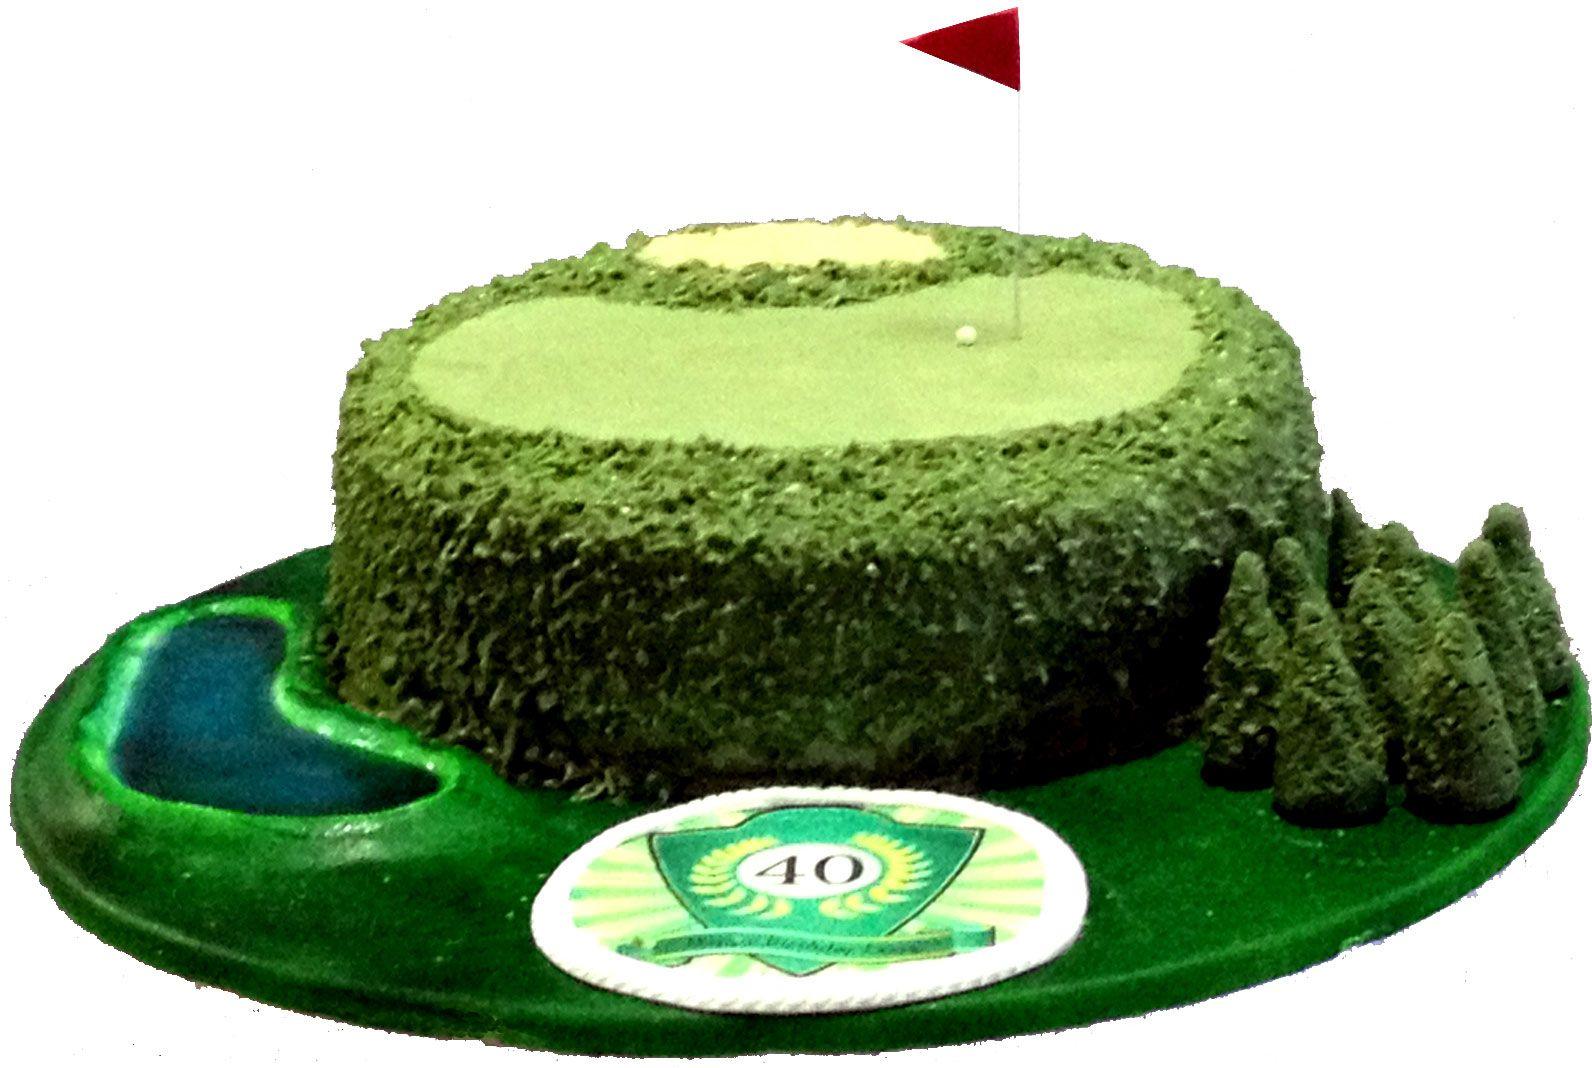 Golf Course Cake  Like us on Facebook @ www.facebook.com/Meli.Ann.Designs